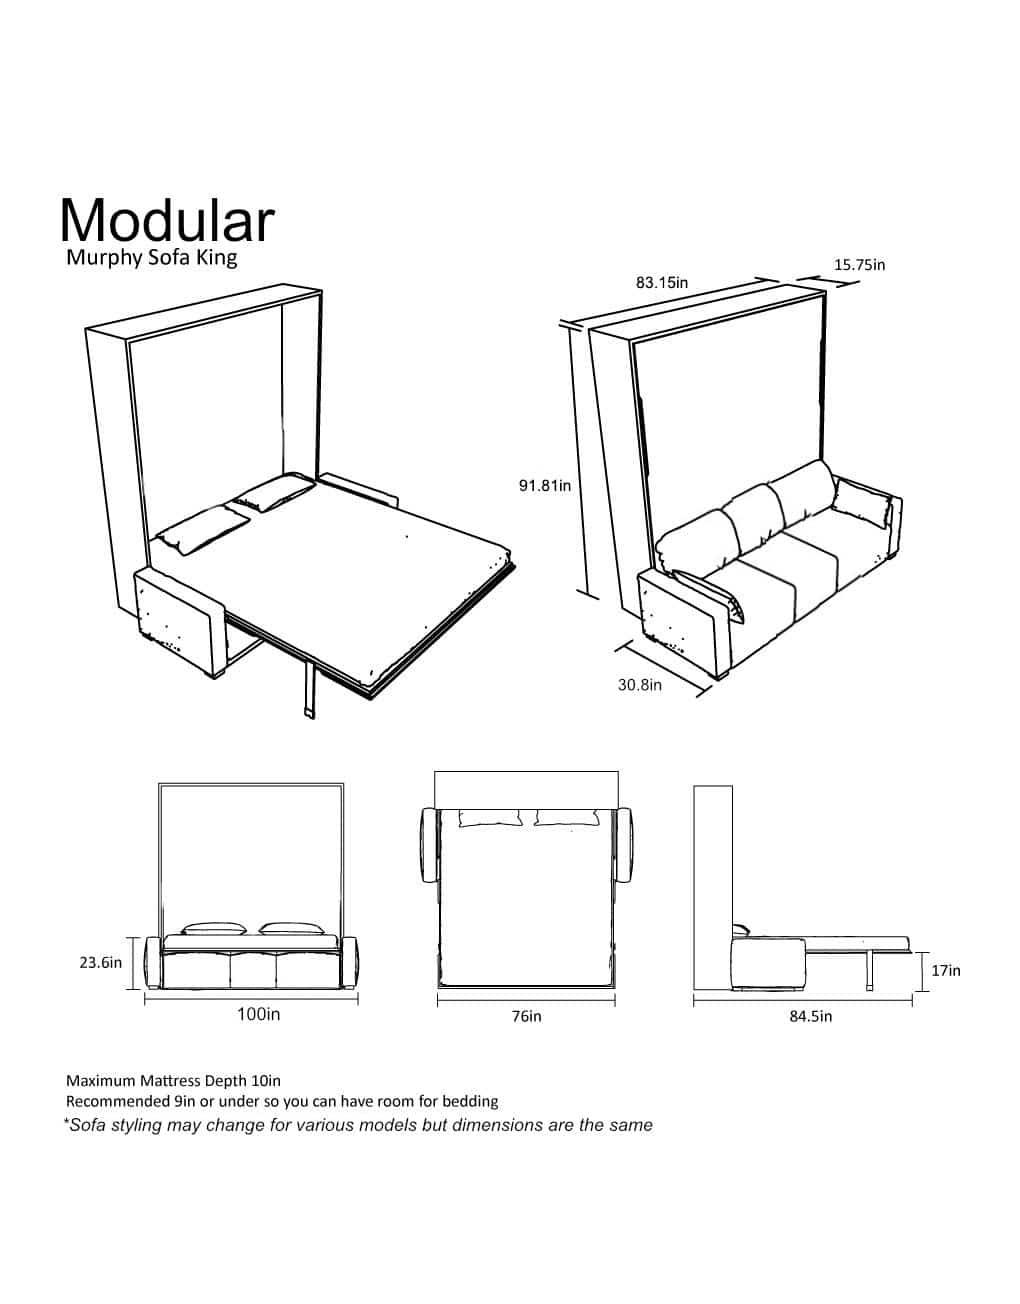 Modular King Size Sofa Wall Bed